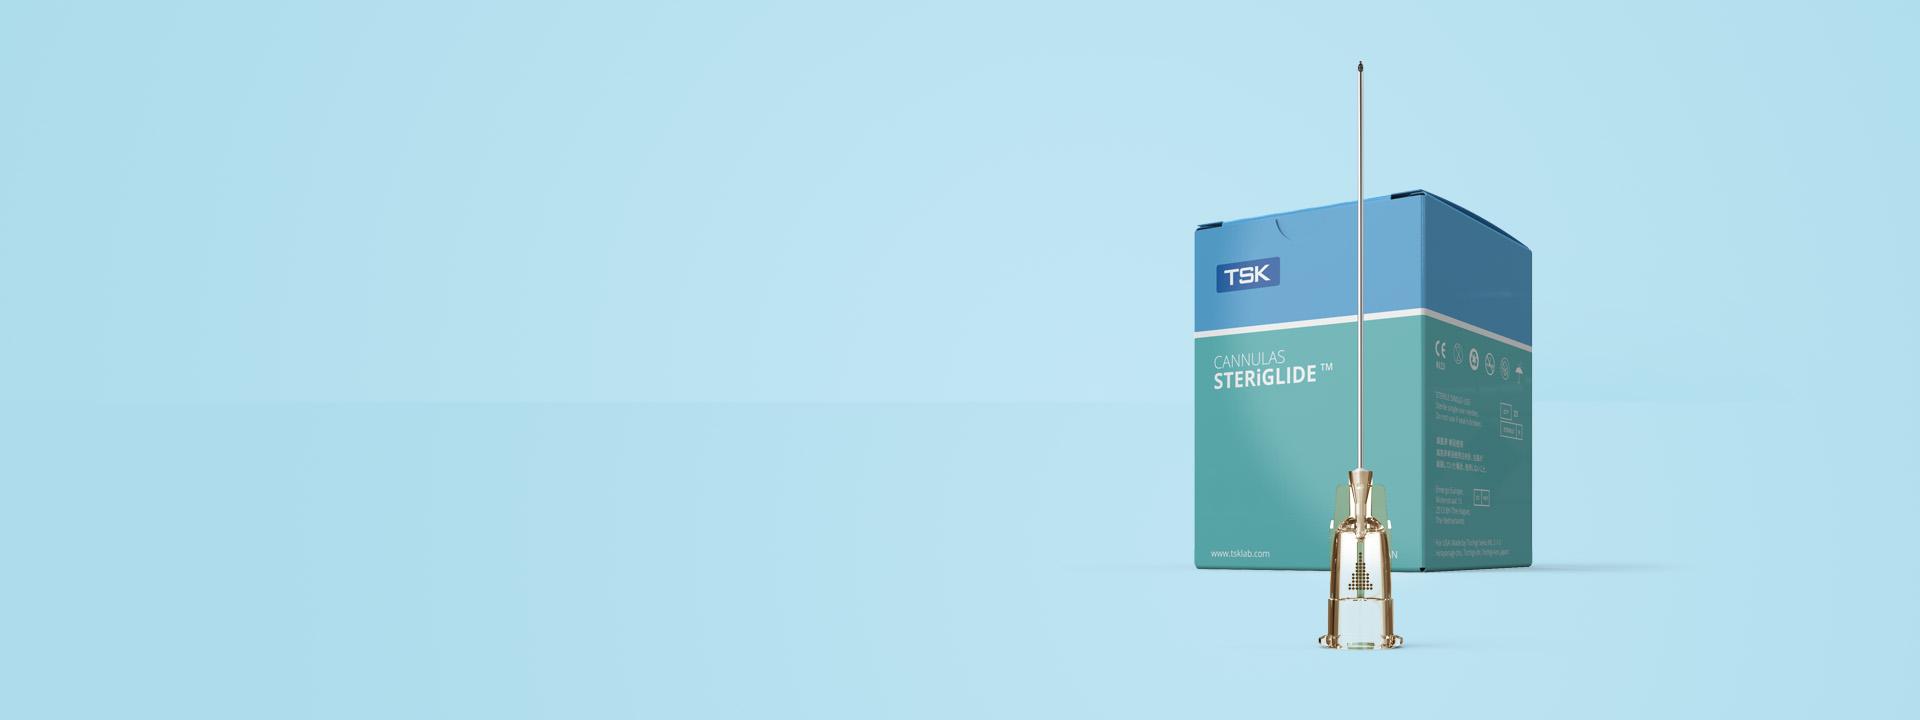 Fullwidth-STERiGLIDE-cannula-8